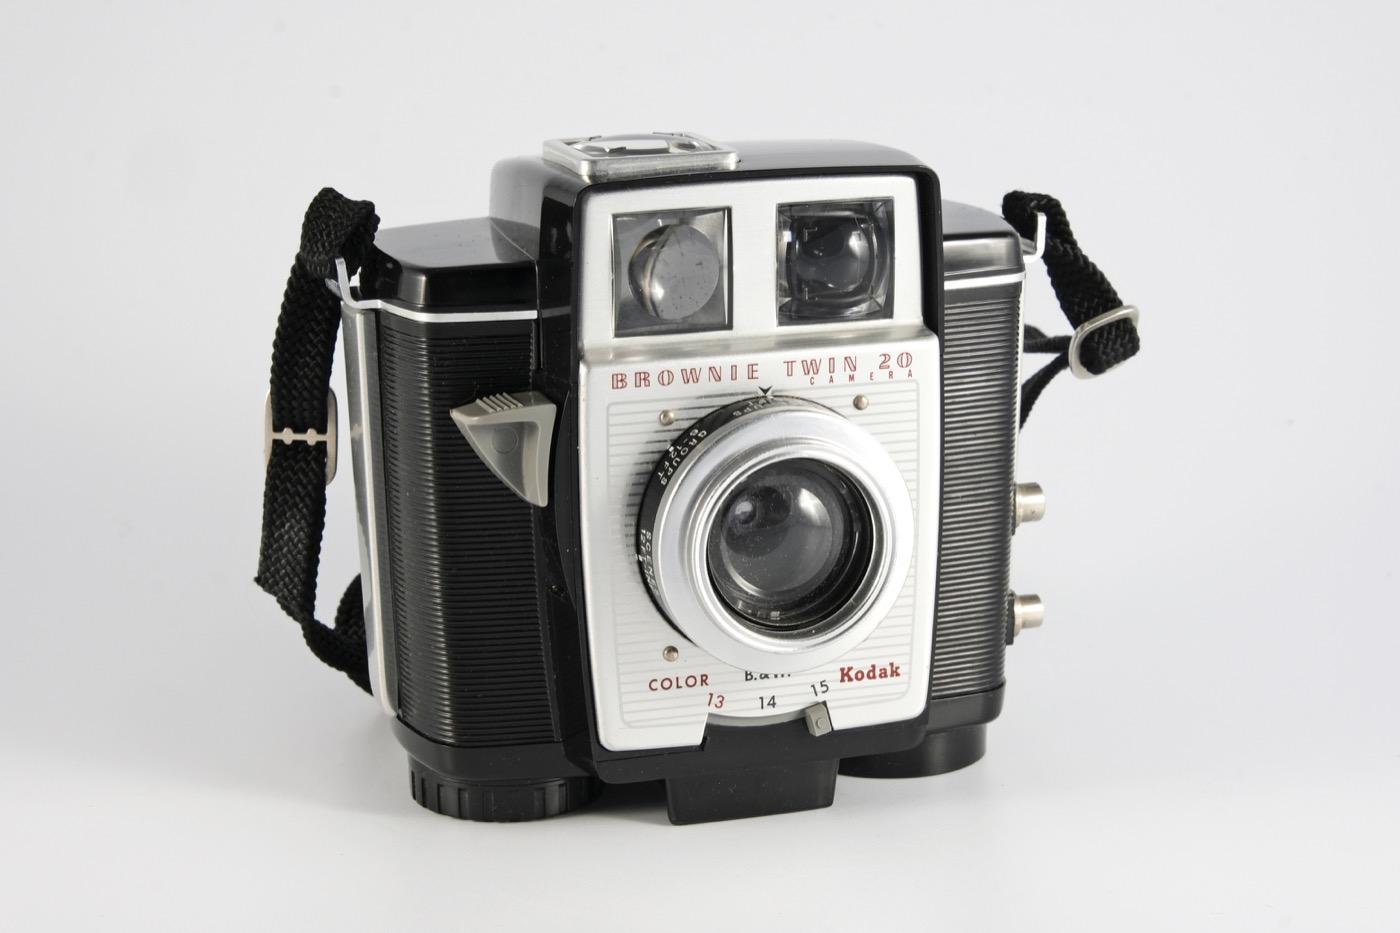 Kodak Brownie Twin 20 camera